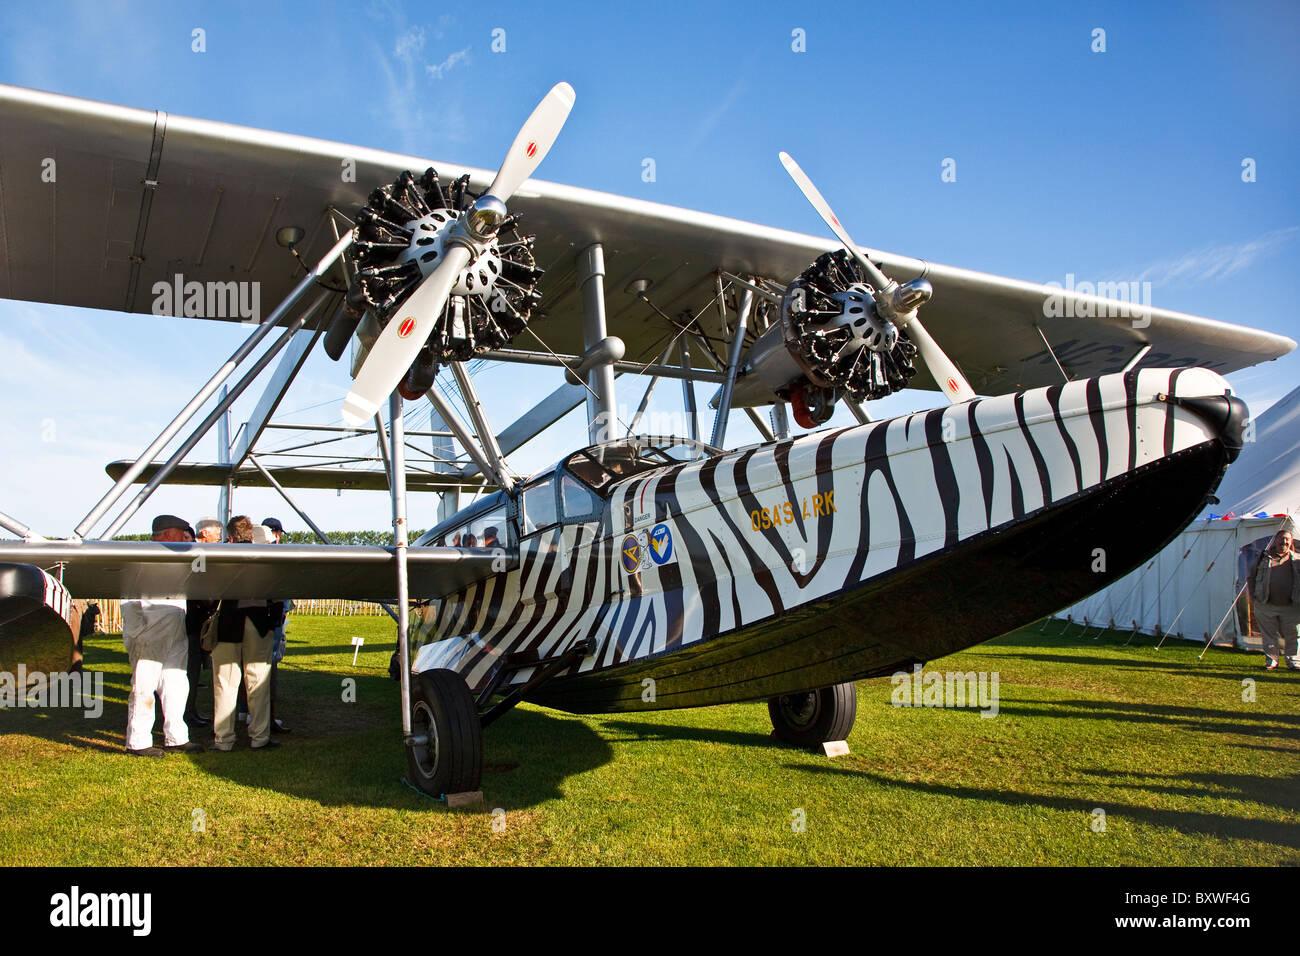 1928 Type, Sikorsky S-38, NC-28V, Flying boat, Goodwood Revival 2010 - Stock Image